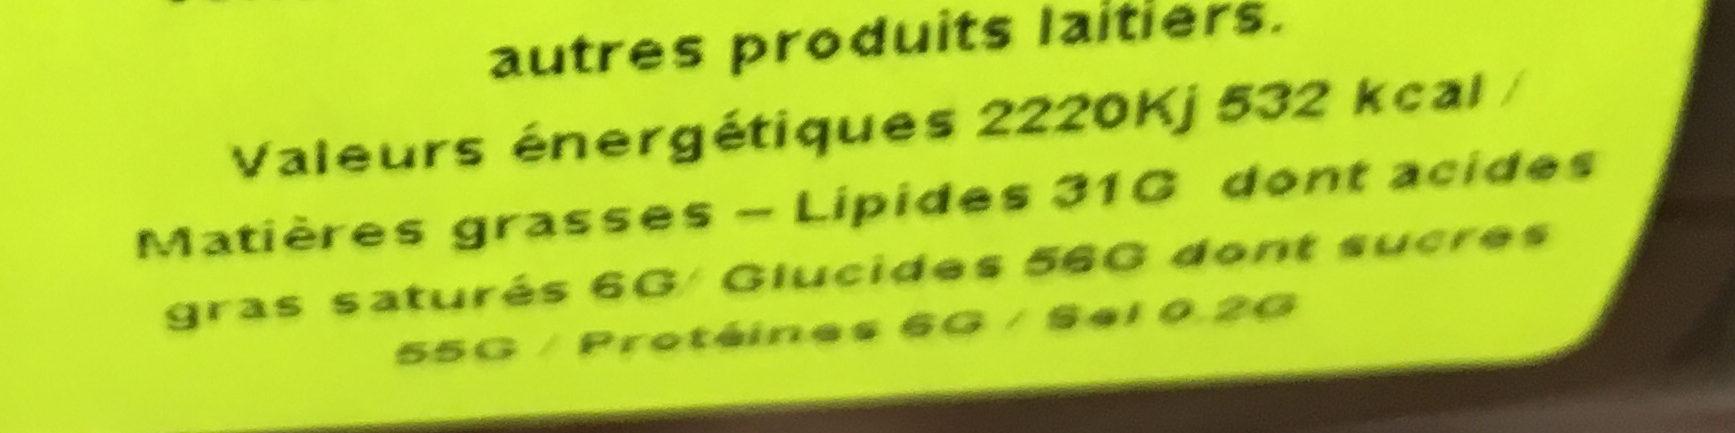 Lacasitos - Nutrition facts